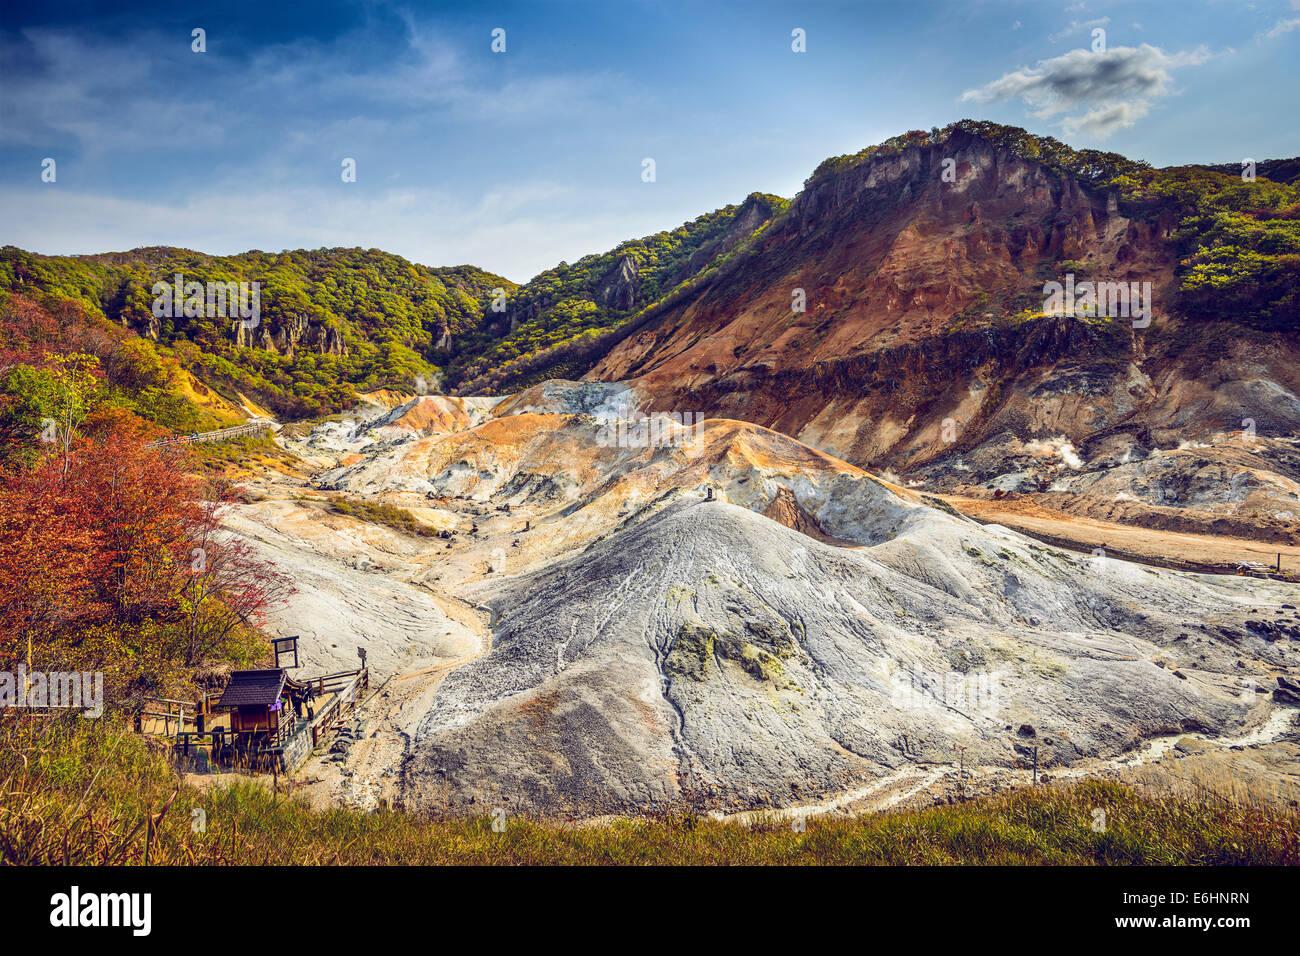 Noboribetsu, Hokkaido, Giappone Jigokudani a valle dell'Inferno. Immagini Stock